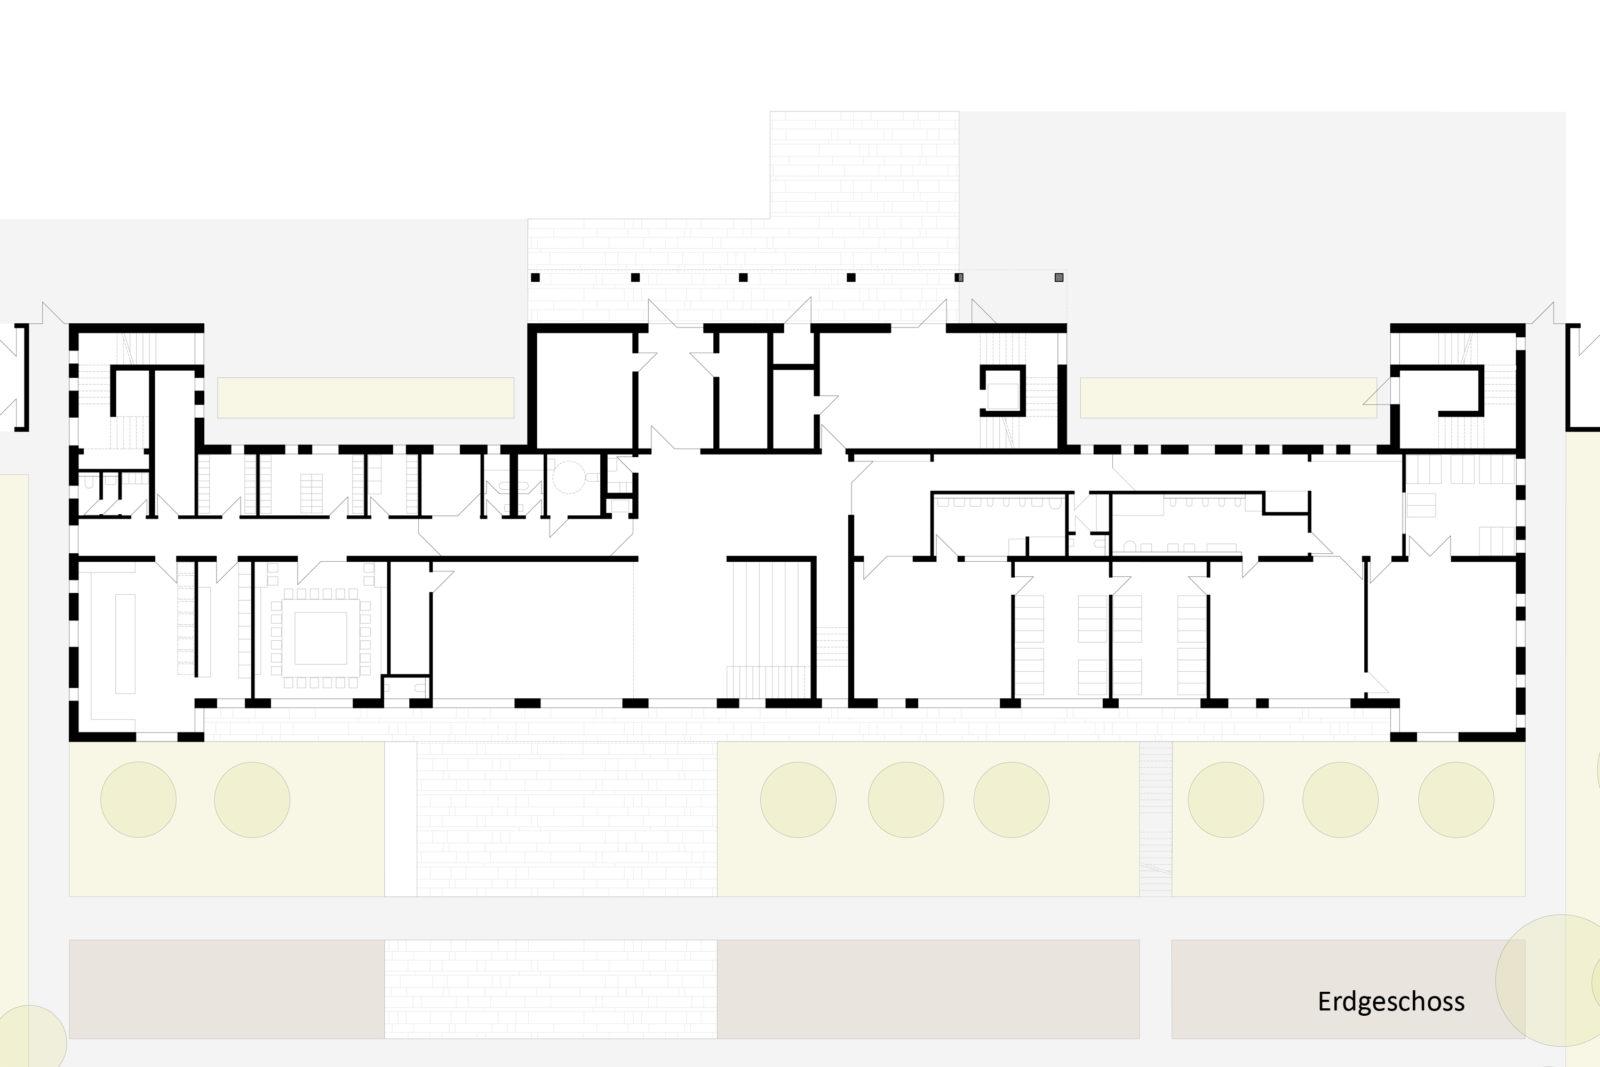 Neubau Kita und Förderschule an der alten Messe, Leipzig - Grundriss Erdgeschoss